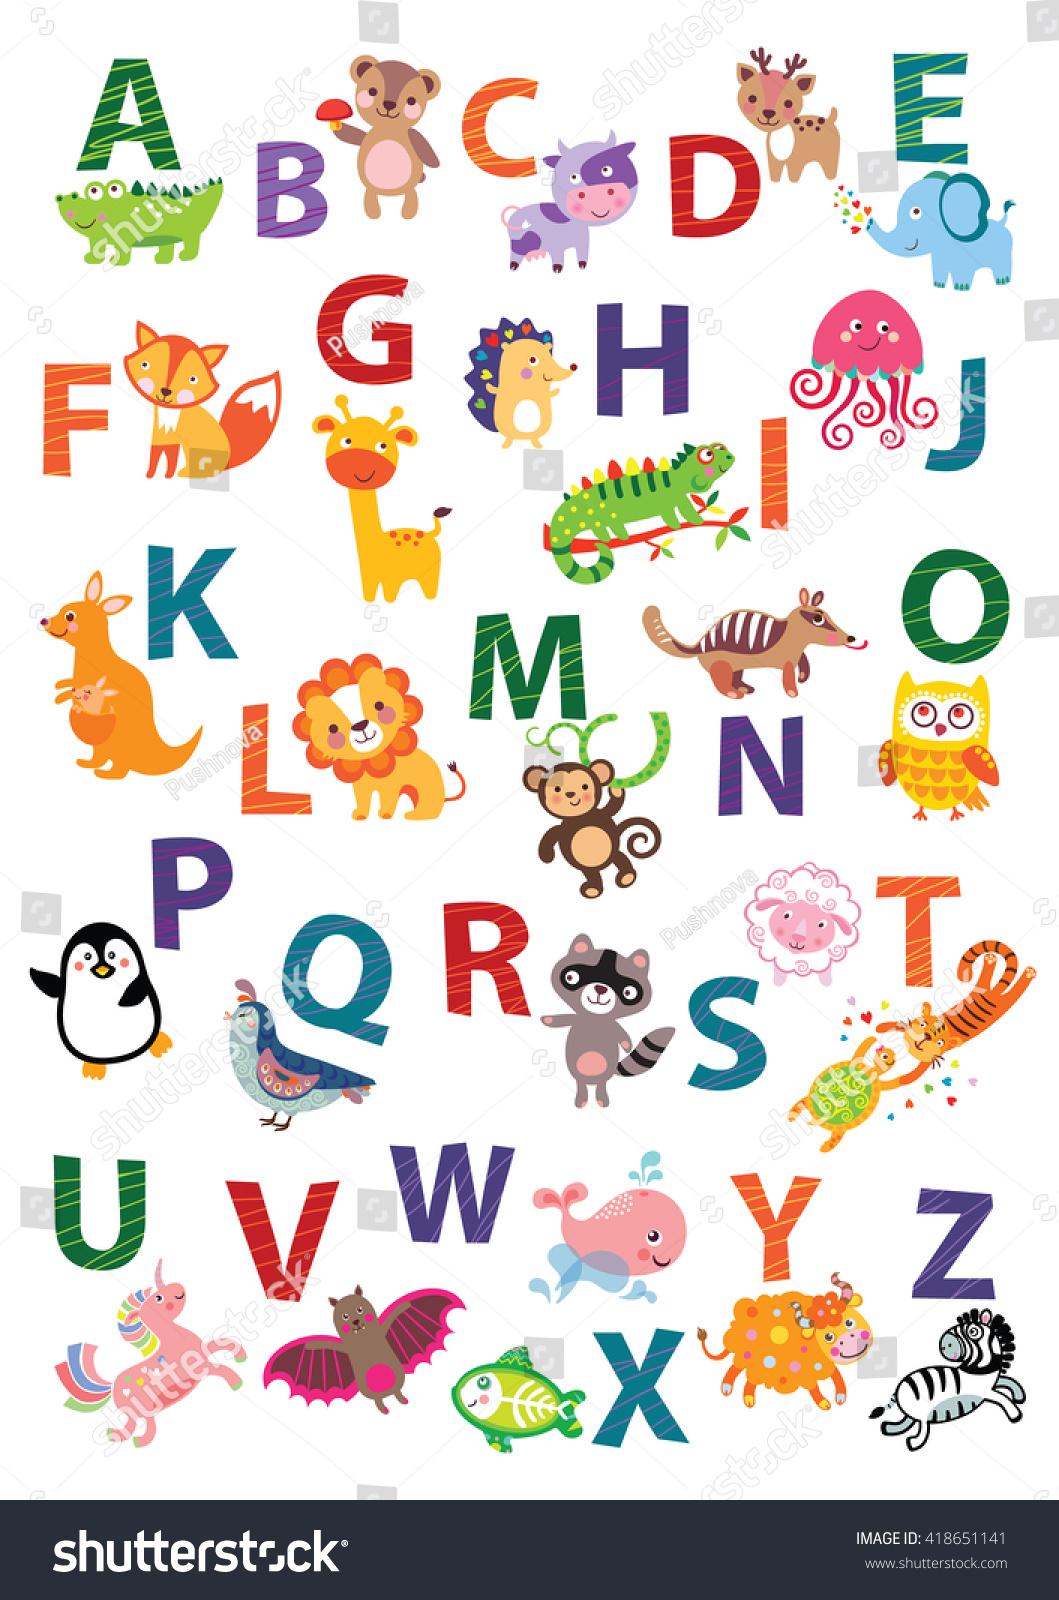 Cute Animal Alphabet English Alphabet Poster Nursery